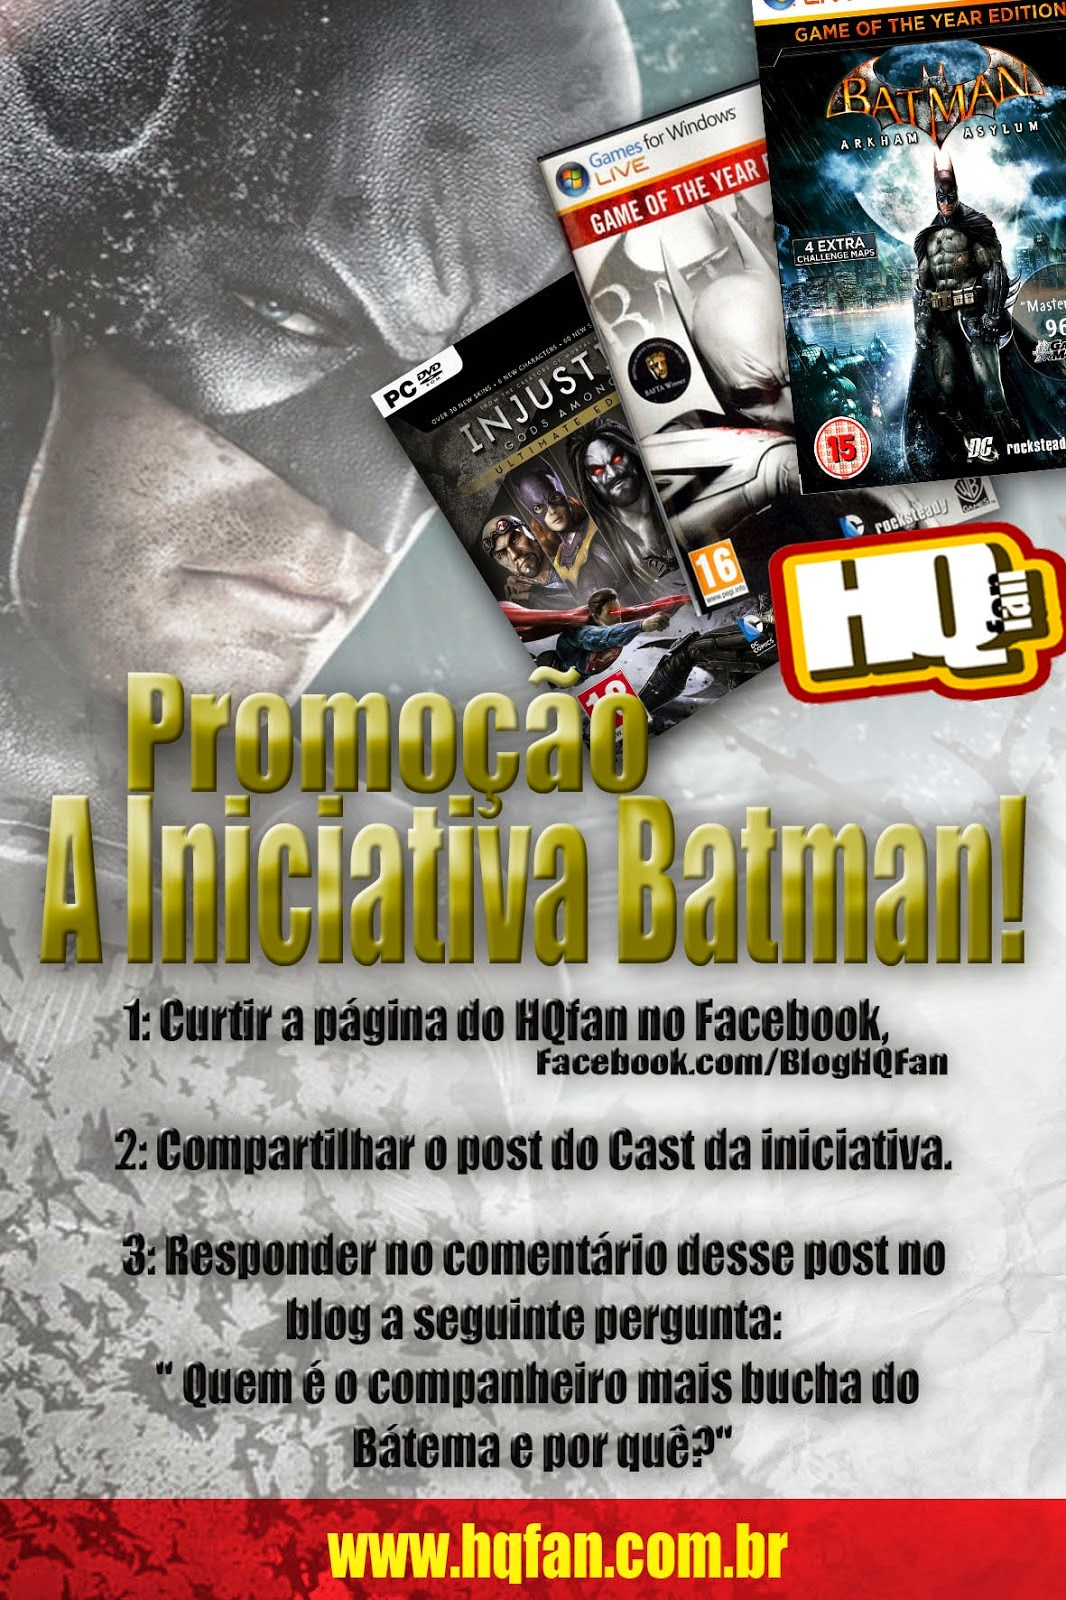 http://www.hqfan.com.br/2014/12/promoceta-pra-comemorar-o-aniversario.html